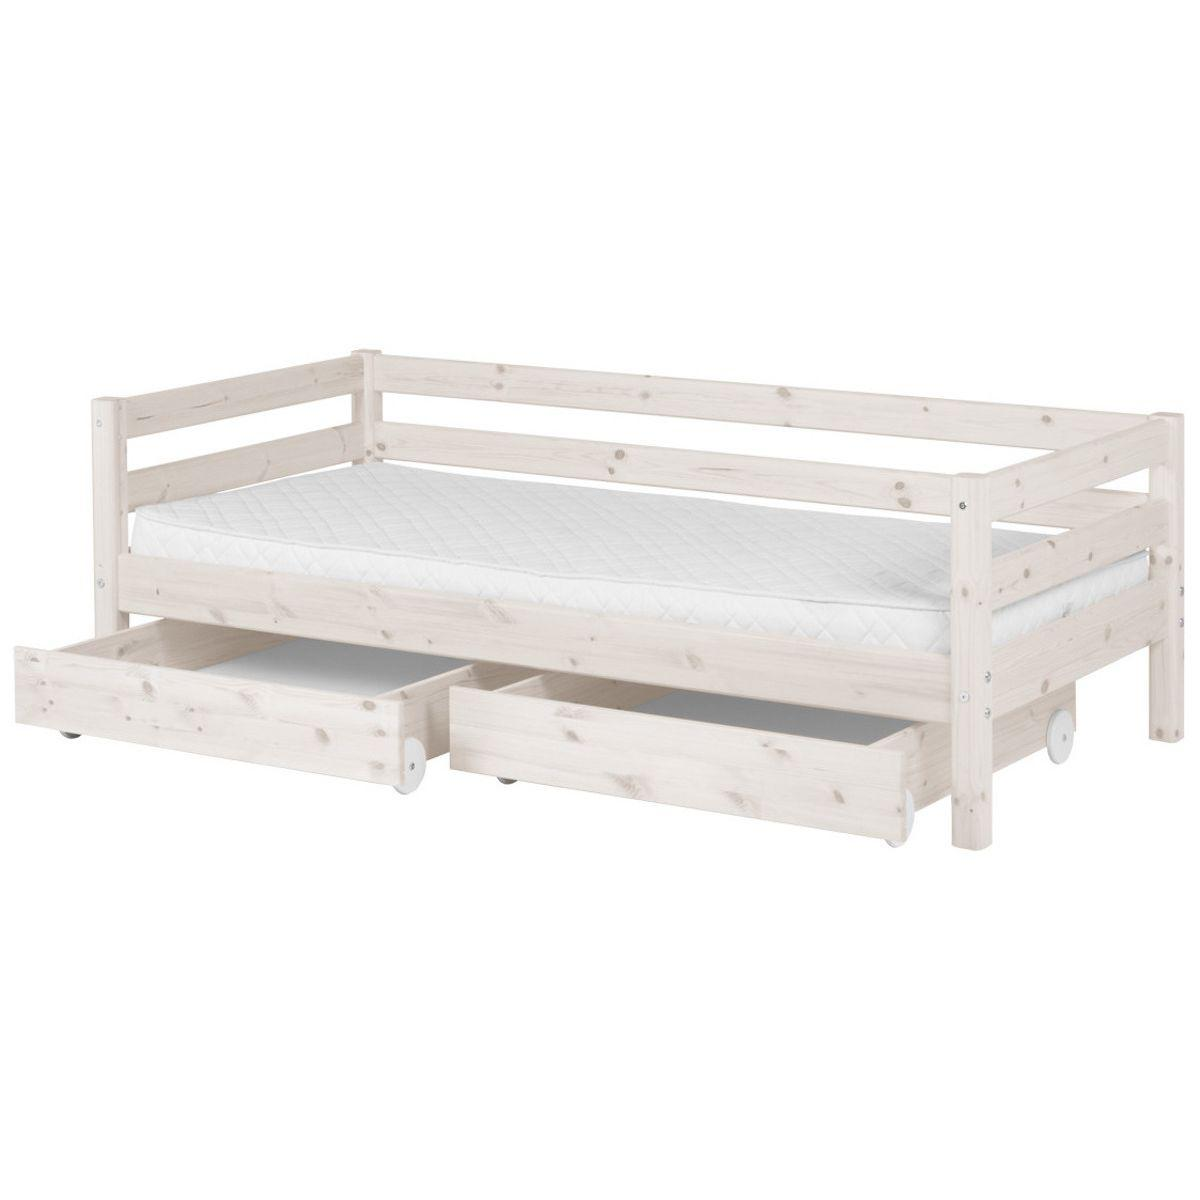 Set 2 cajones bajos Cama 200cm CLASSIC Flexa blanco cal